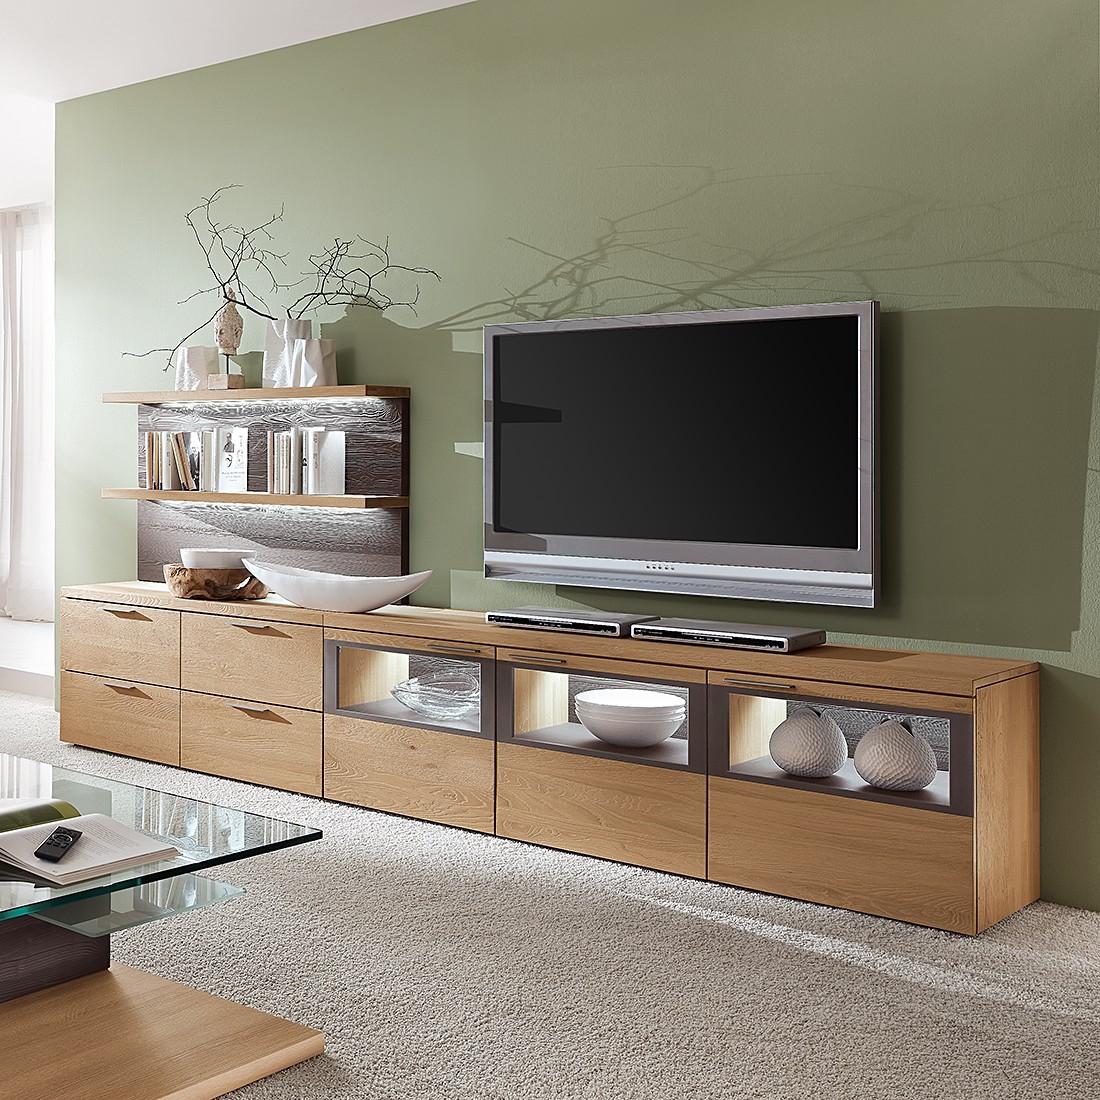 wohnwand eiche massiv preisvergleiche. Black Bedroom Furniture Sets. Home Design Ideas